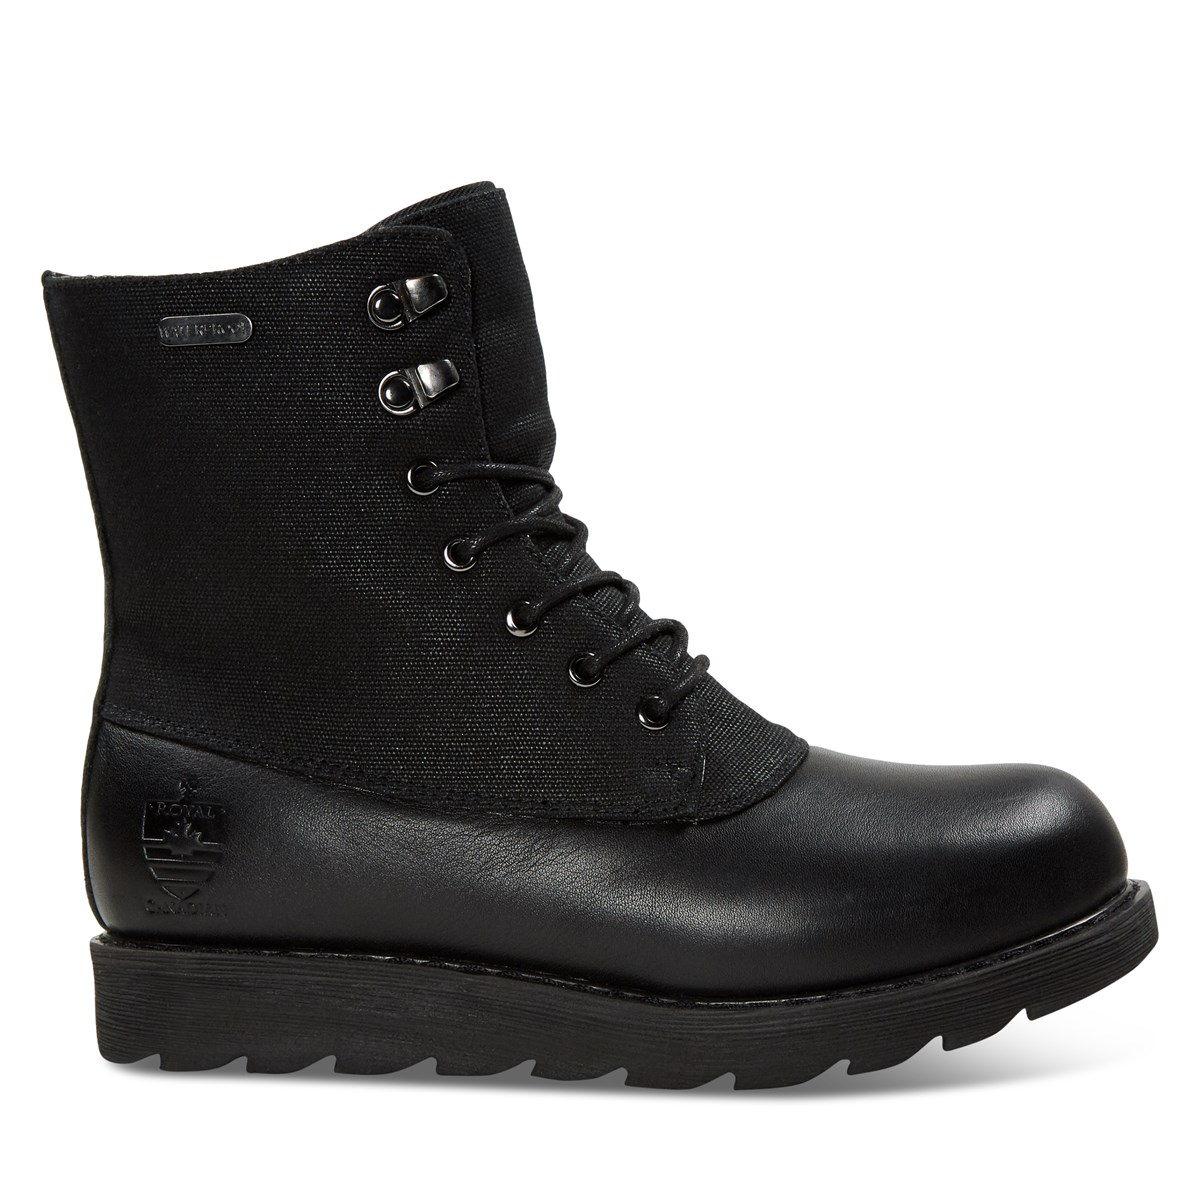 Women's Lasalle Boots in Black